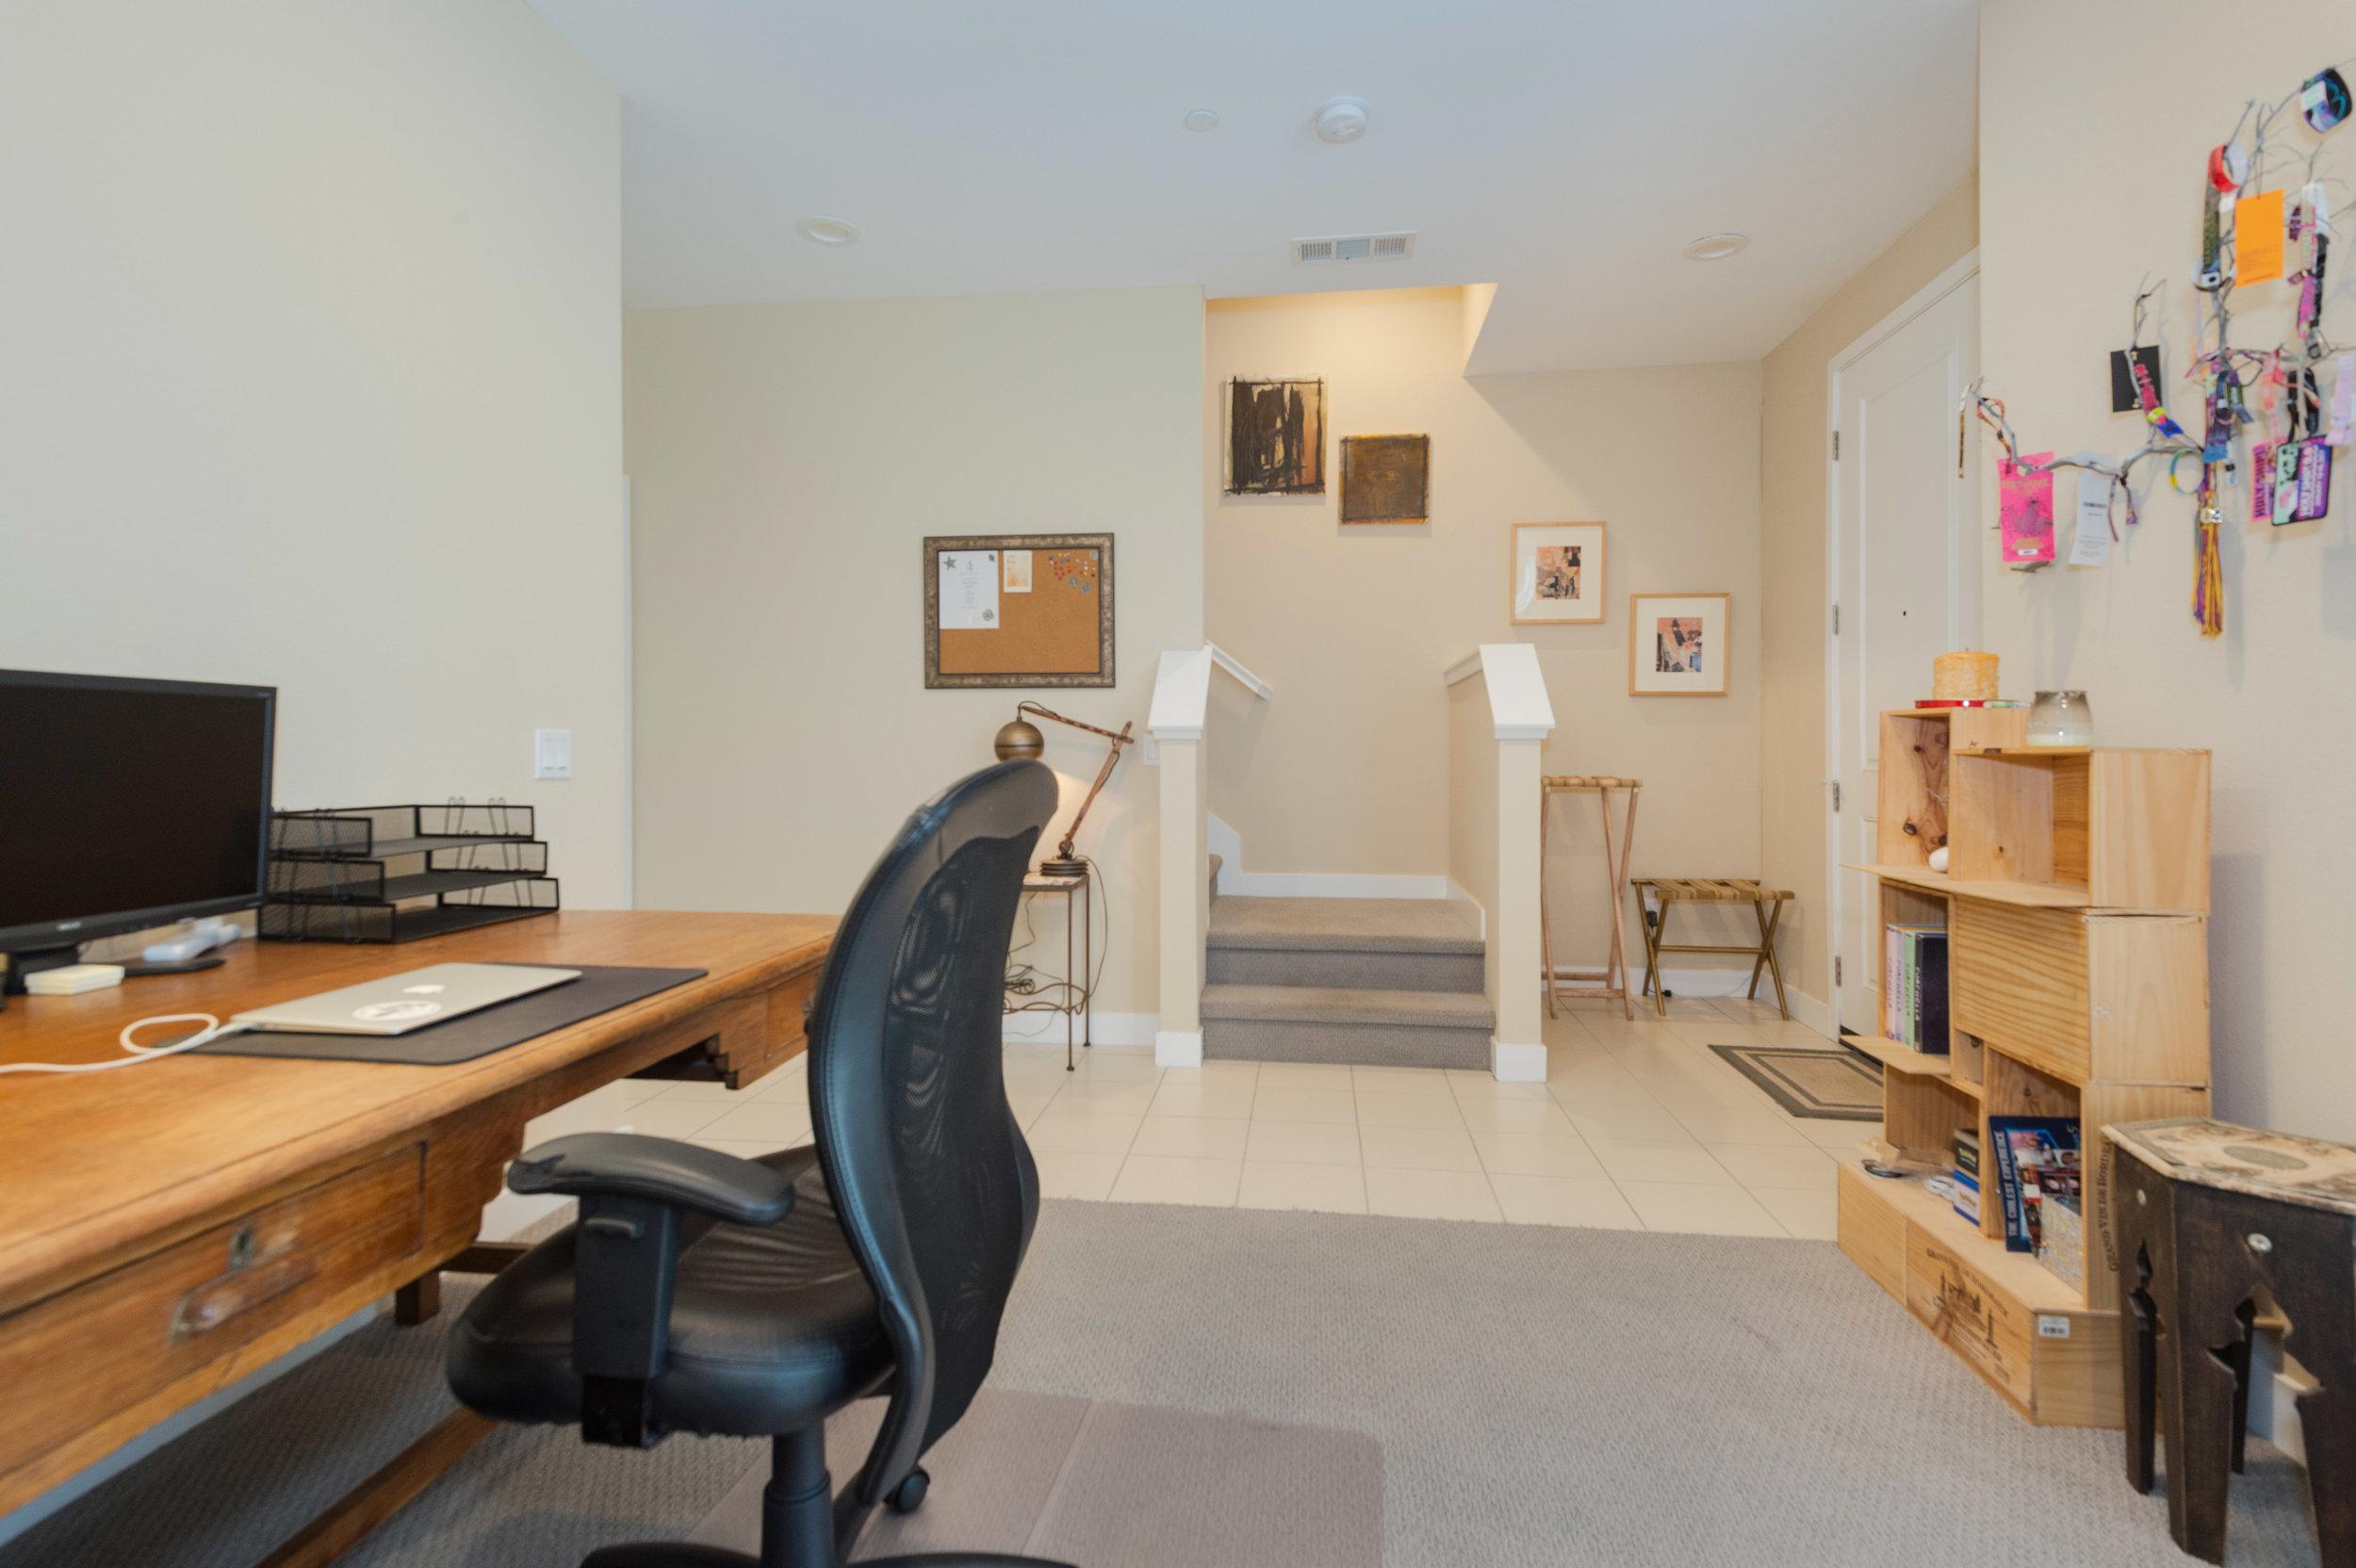 019 Office Den 207 Westpark Court Unit 702 Camarillo Bally Khehra For Sale Lease The Malibu Life Team Luxury Real Estate.jpg